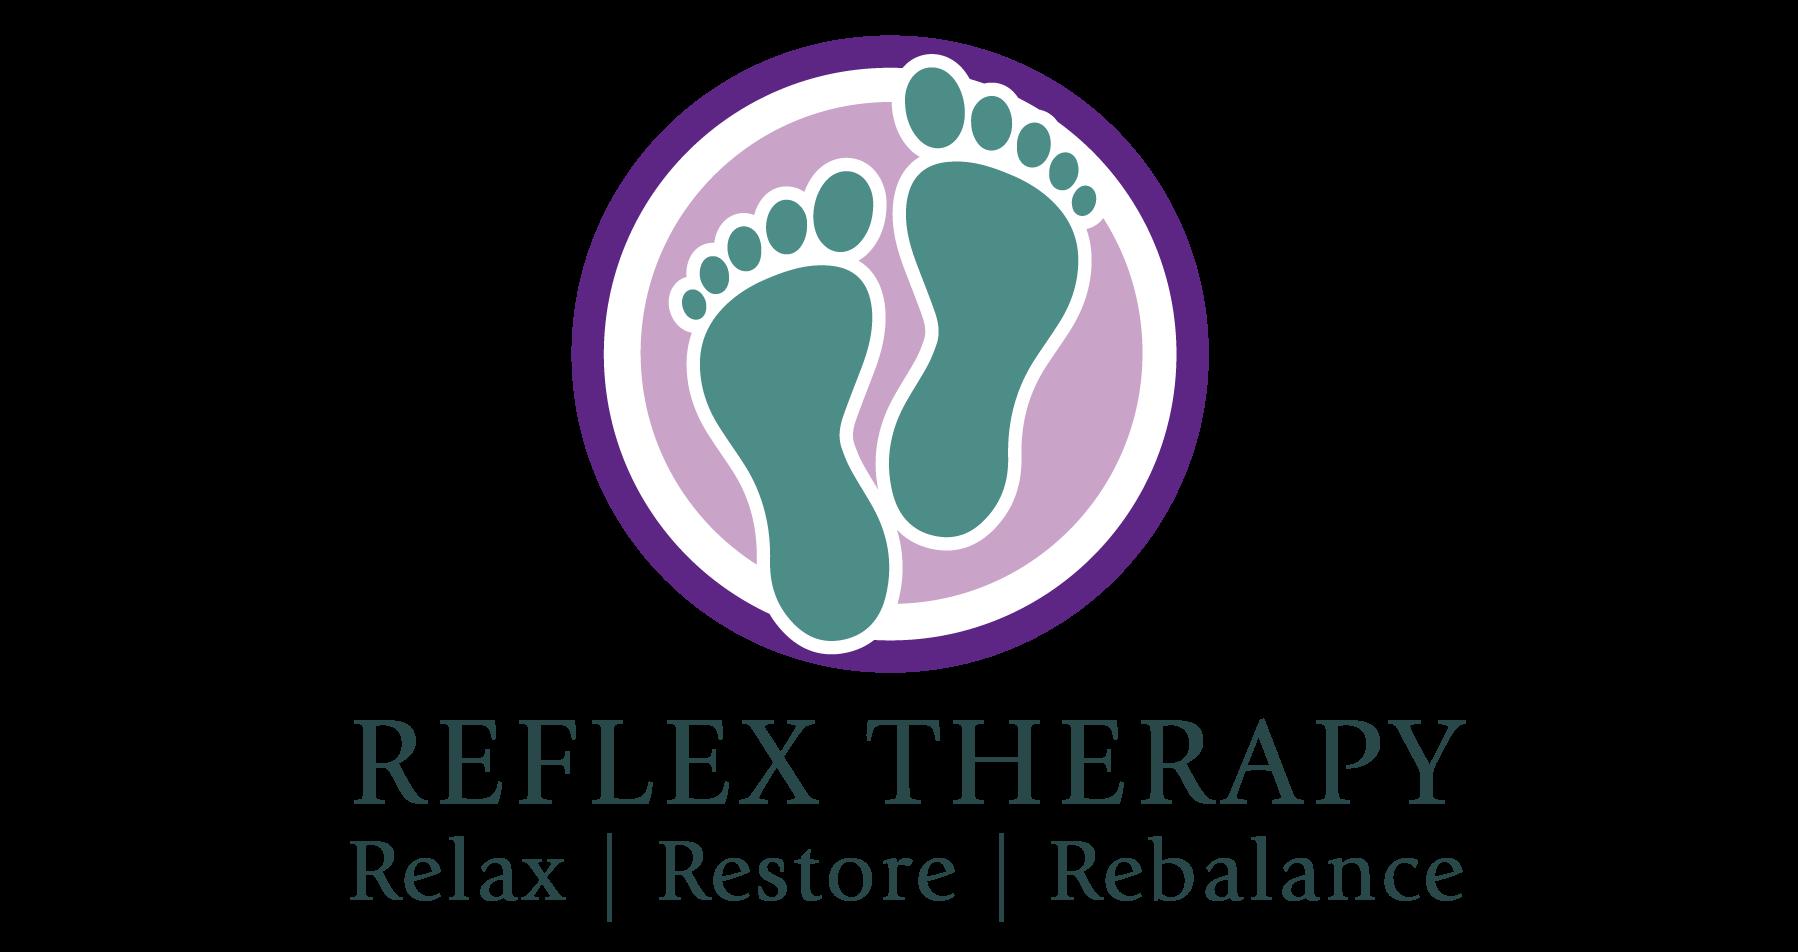 Reflex Therapy